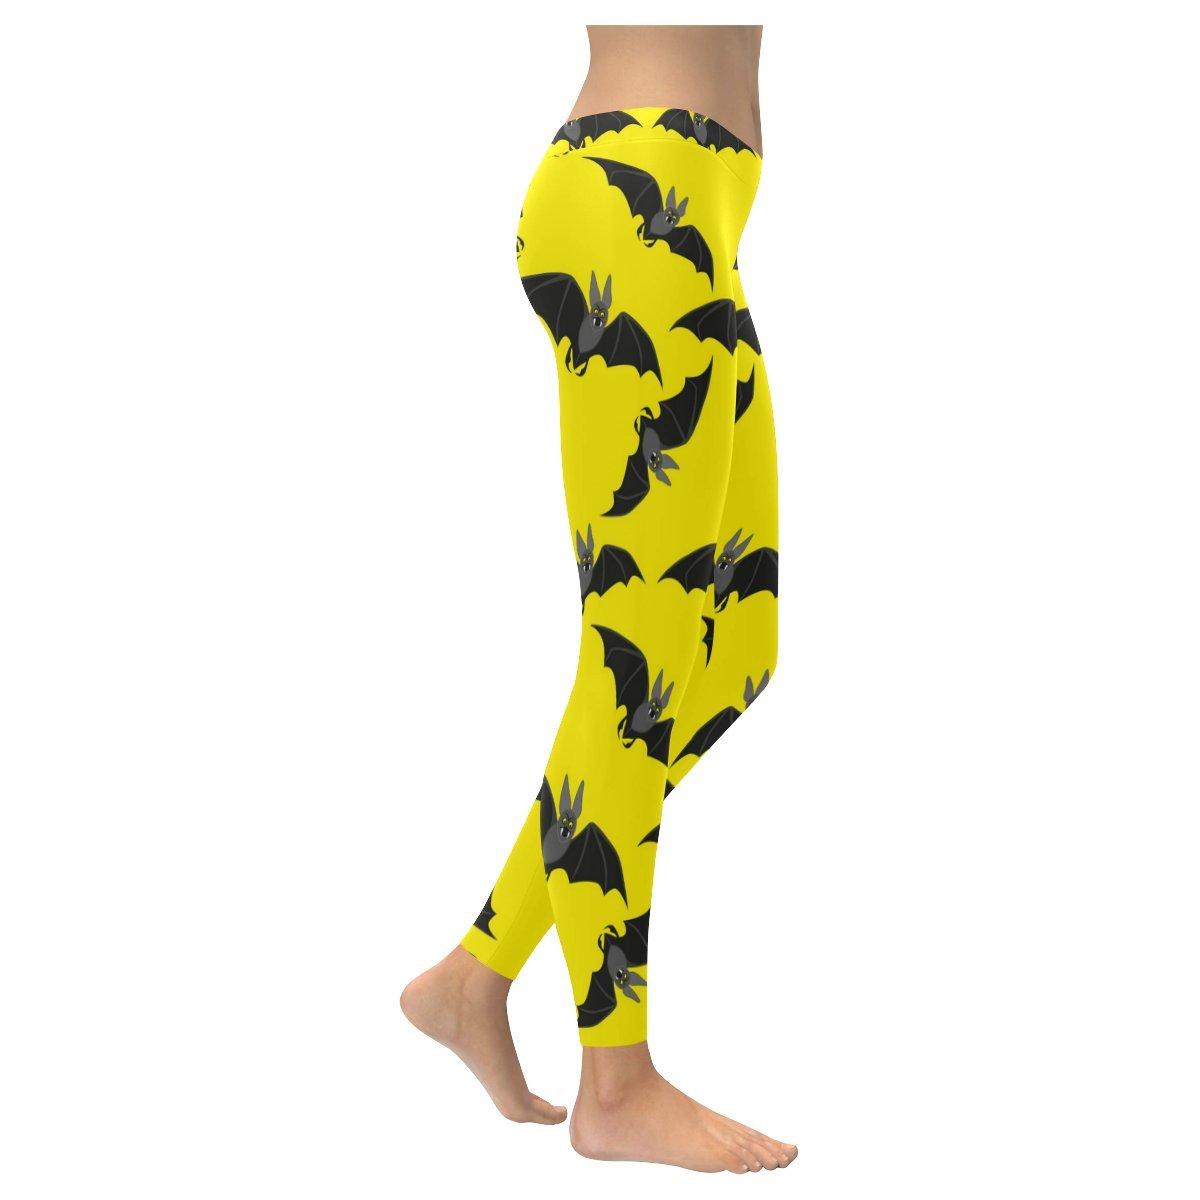 Custom Black Bats Skinny Leggings Women Girls Stretchy Capri Pants for Yoga Pilates Gym,2XS-5XL